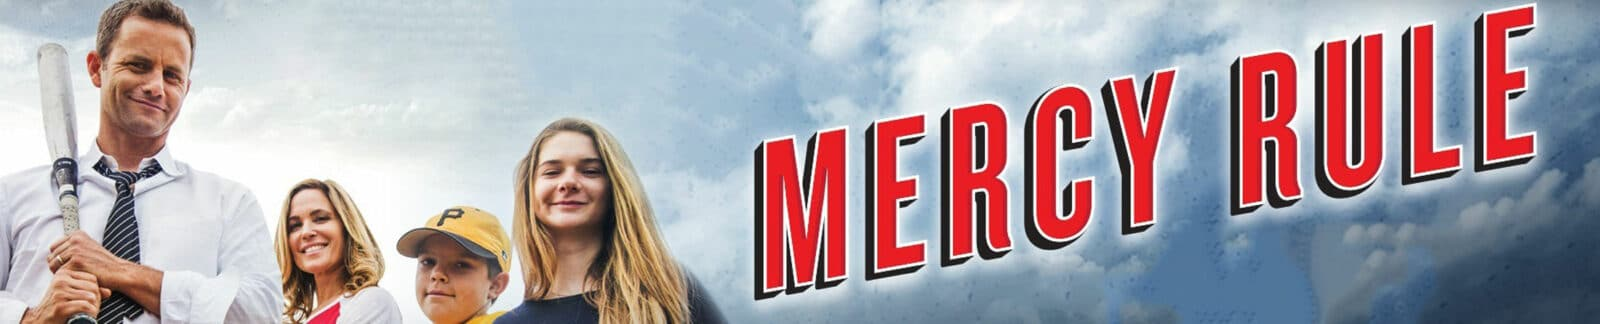 Mercy Rule baseball movie header